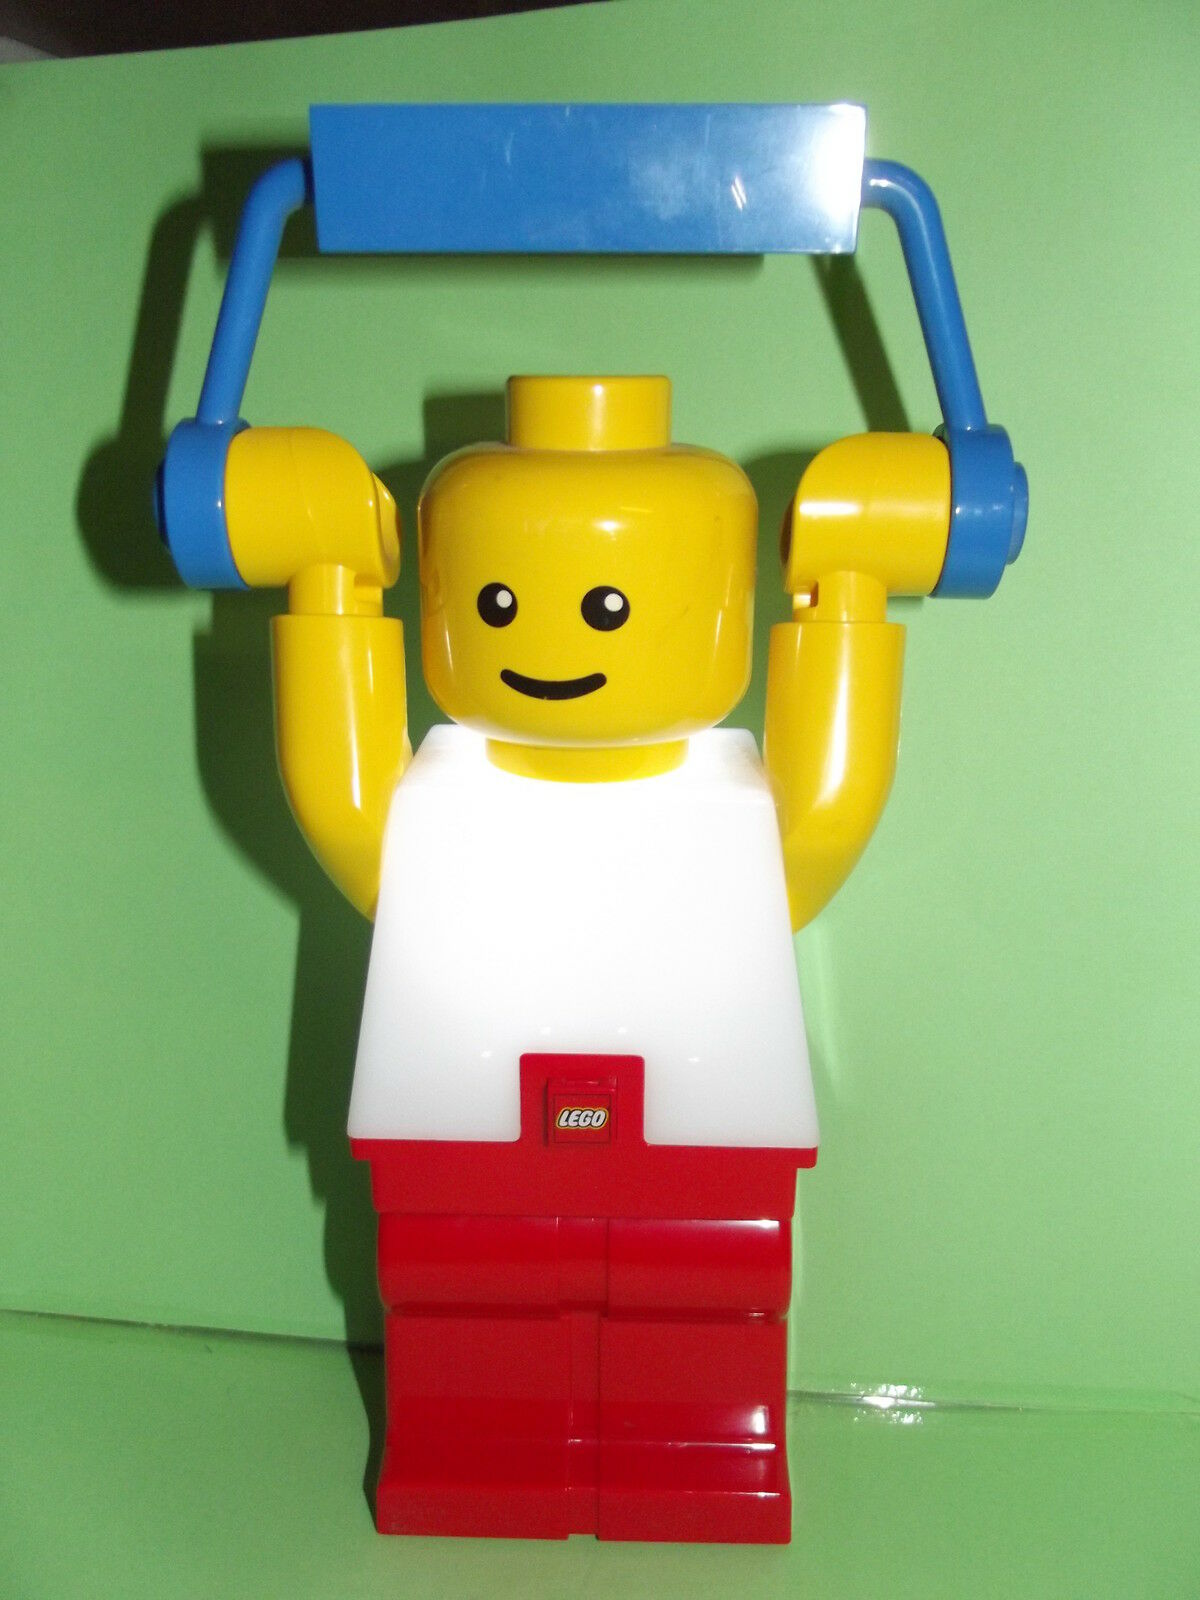 LEGO personaggio -- -- peso sollevatore -- Lampada -- luce notturna -- 22 cm -- rarità assoluta -